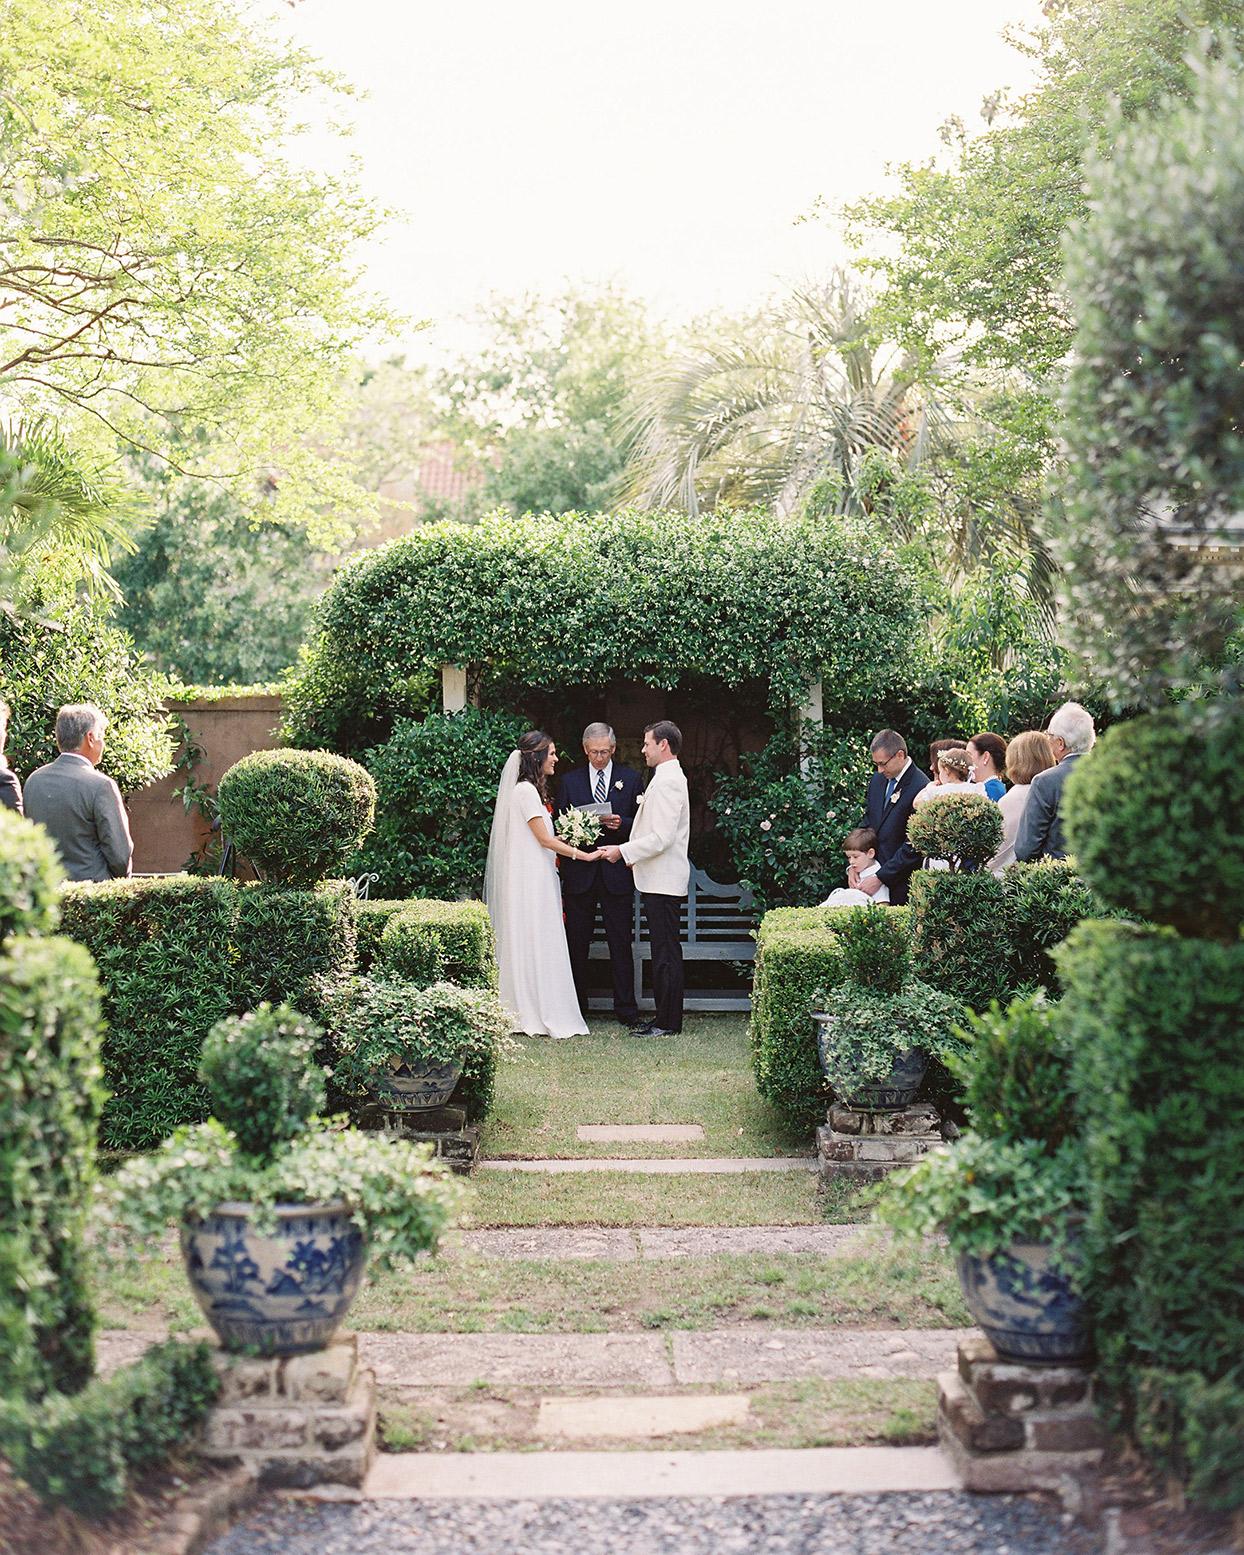 beverly steve wedding ceremony in garden